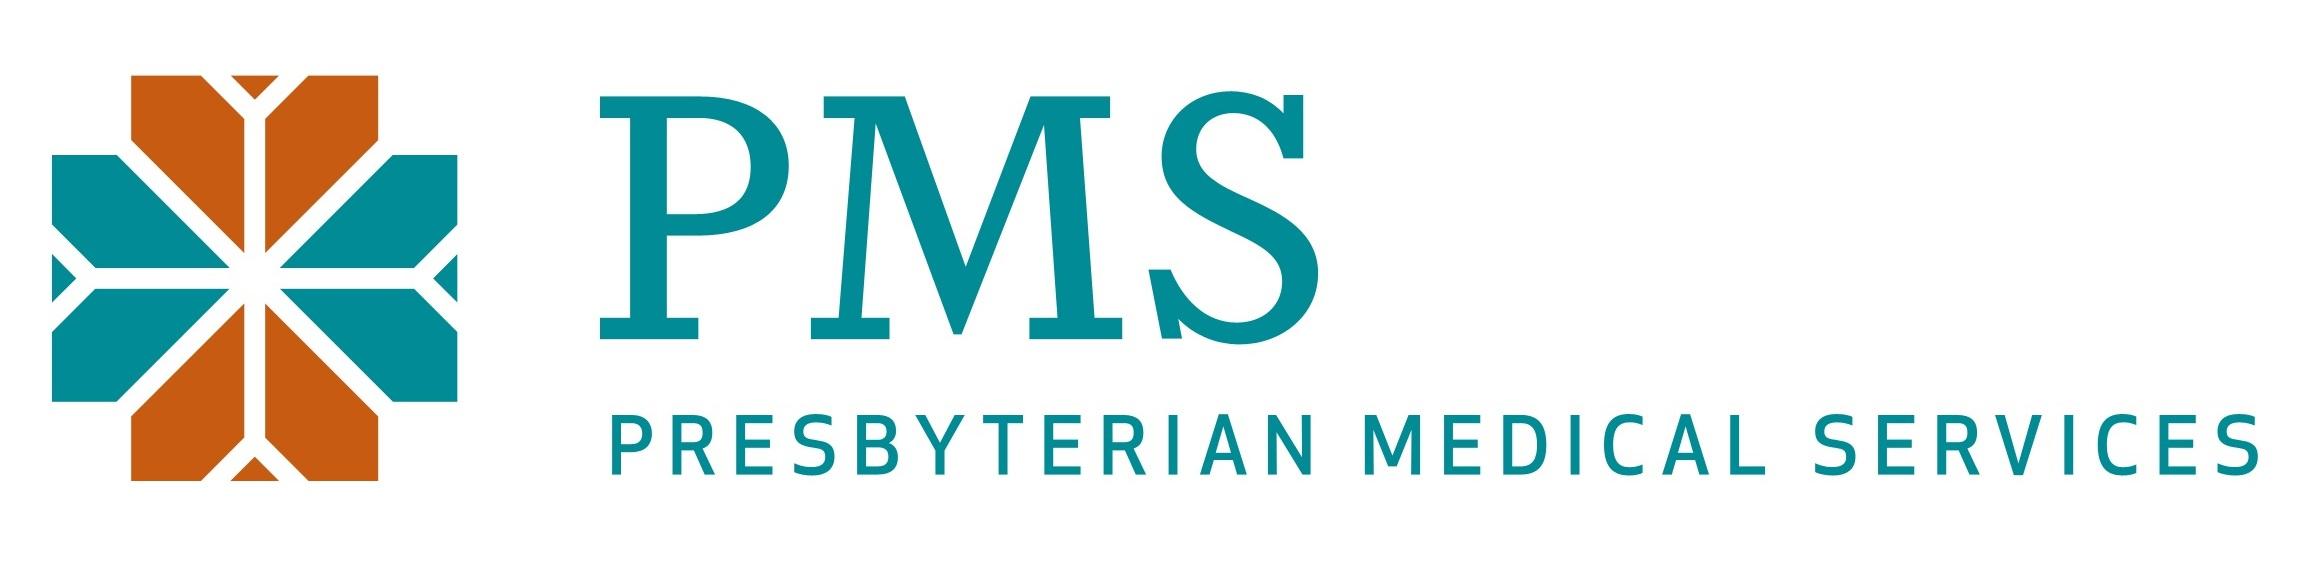 PMS - Presbyterian Medical Services Company Logo